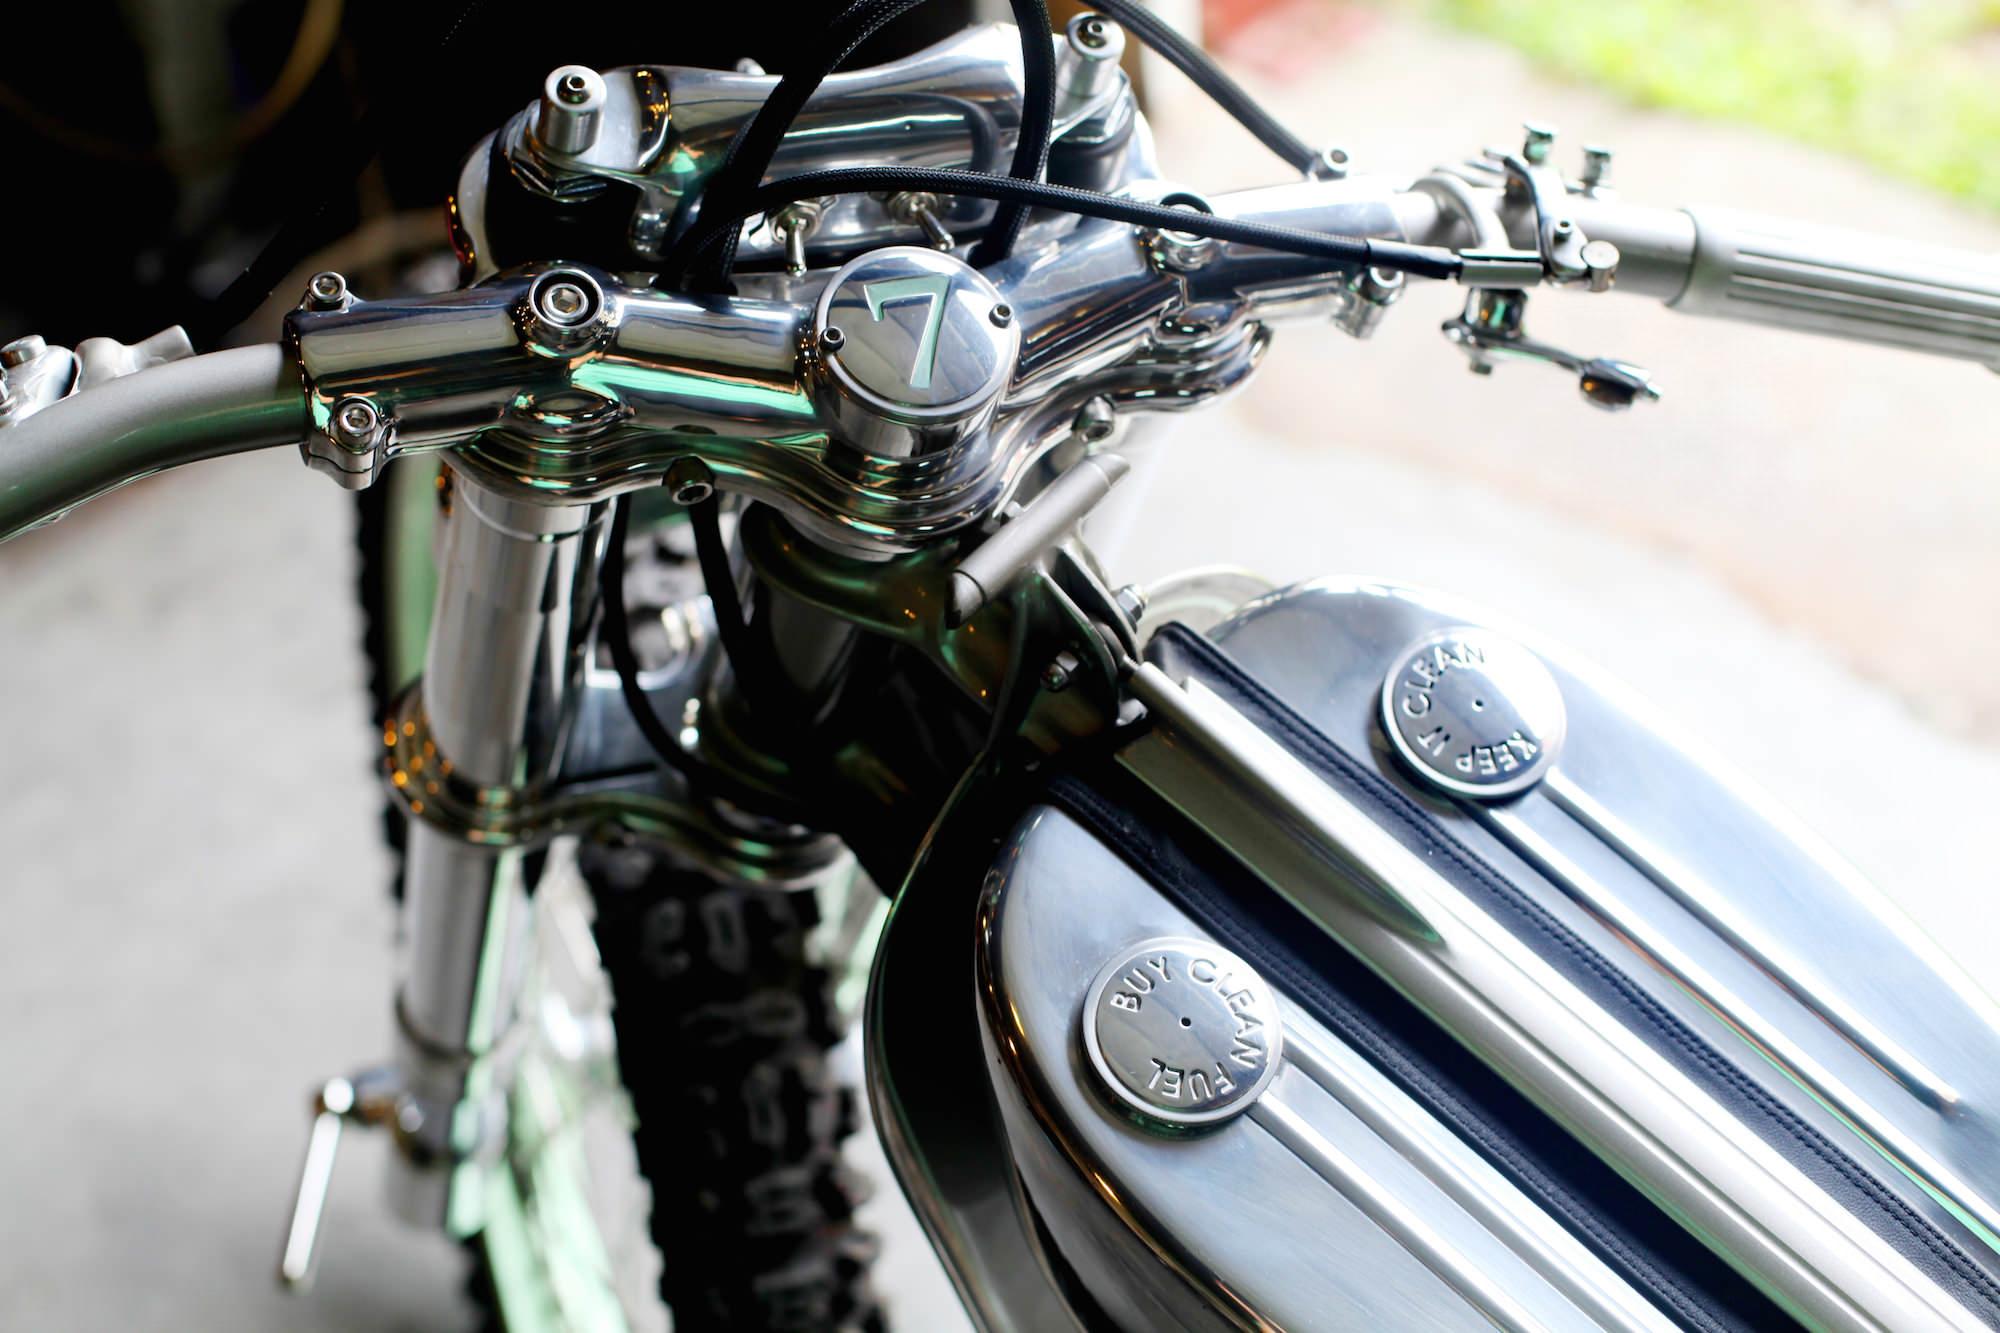 Custom-Buell-Ducati-Motorcycle-19